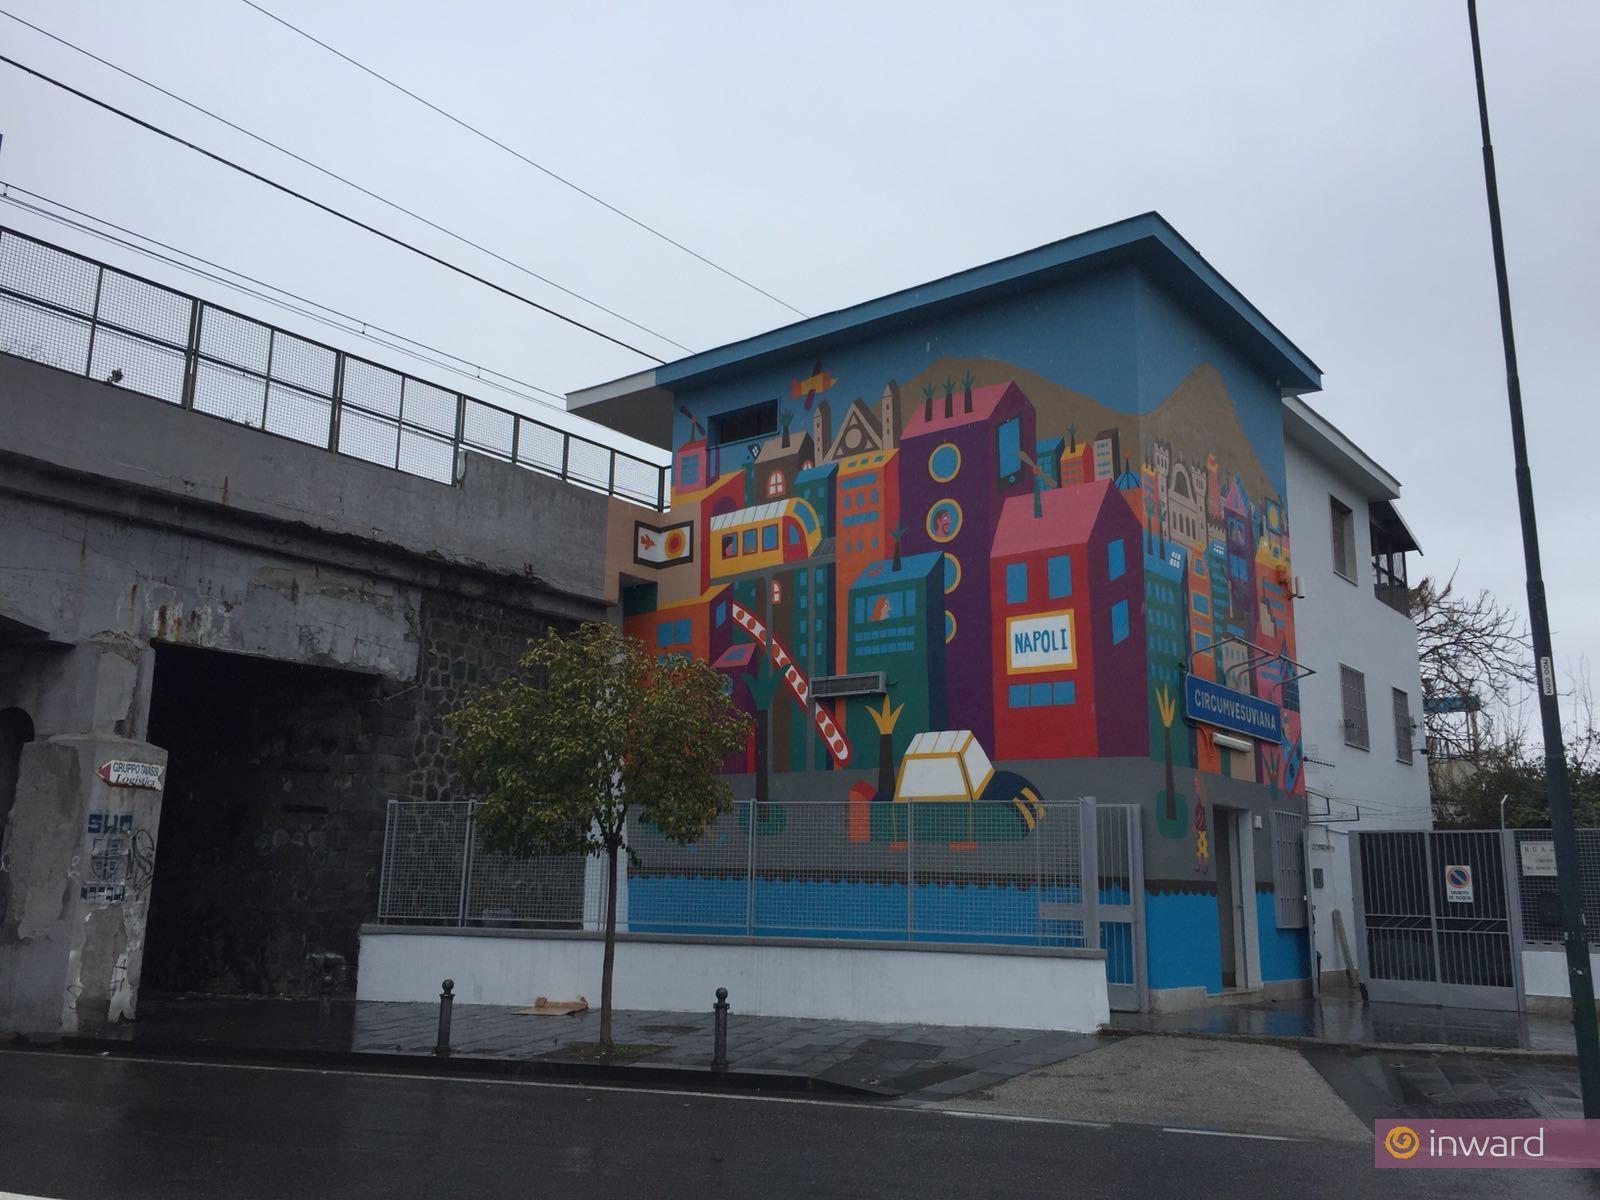 L'opera di Geometric Bang a Napoli